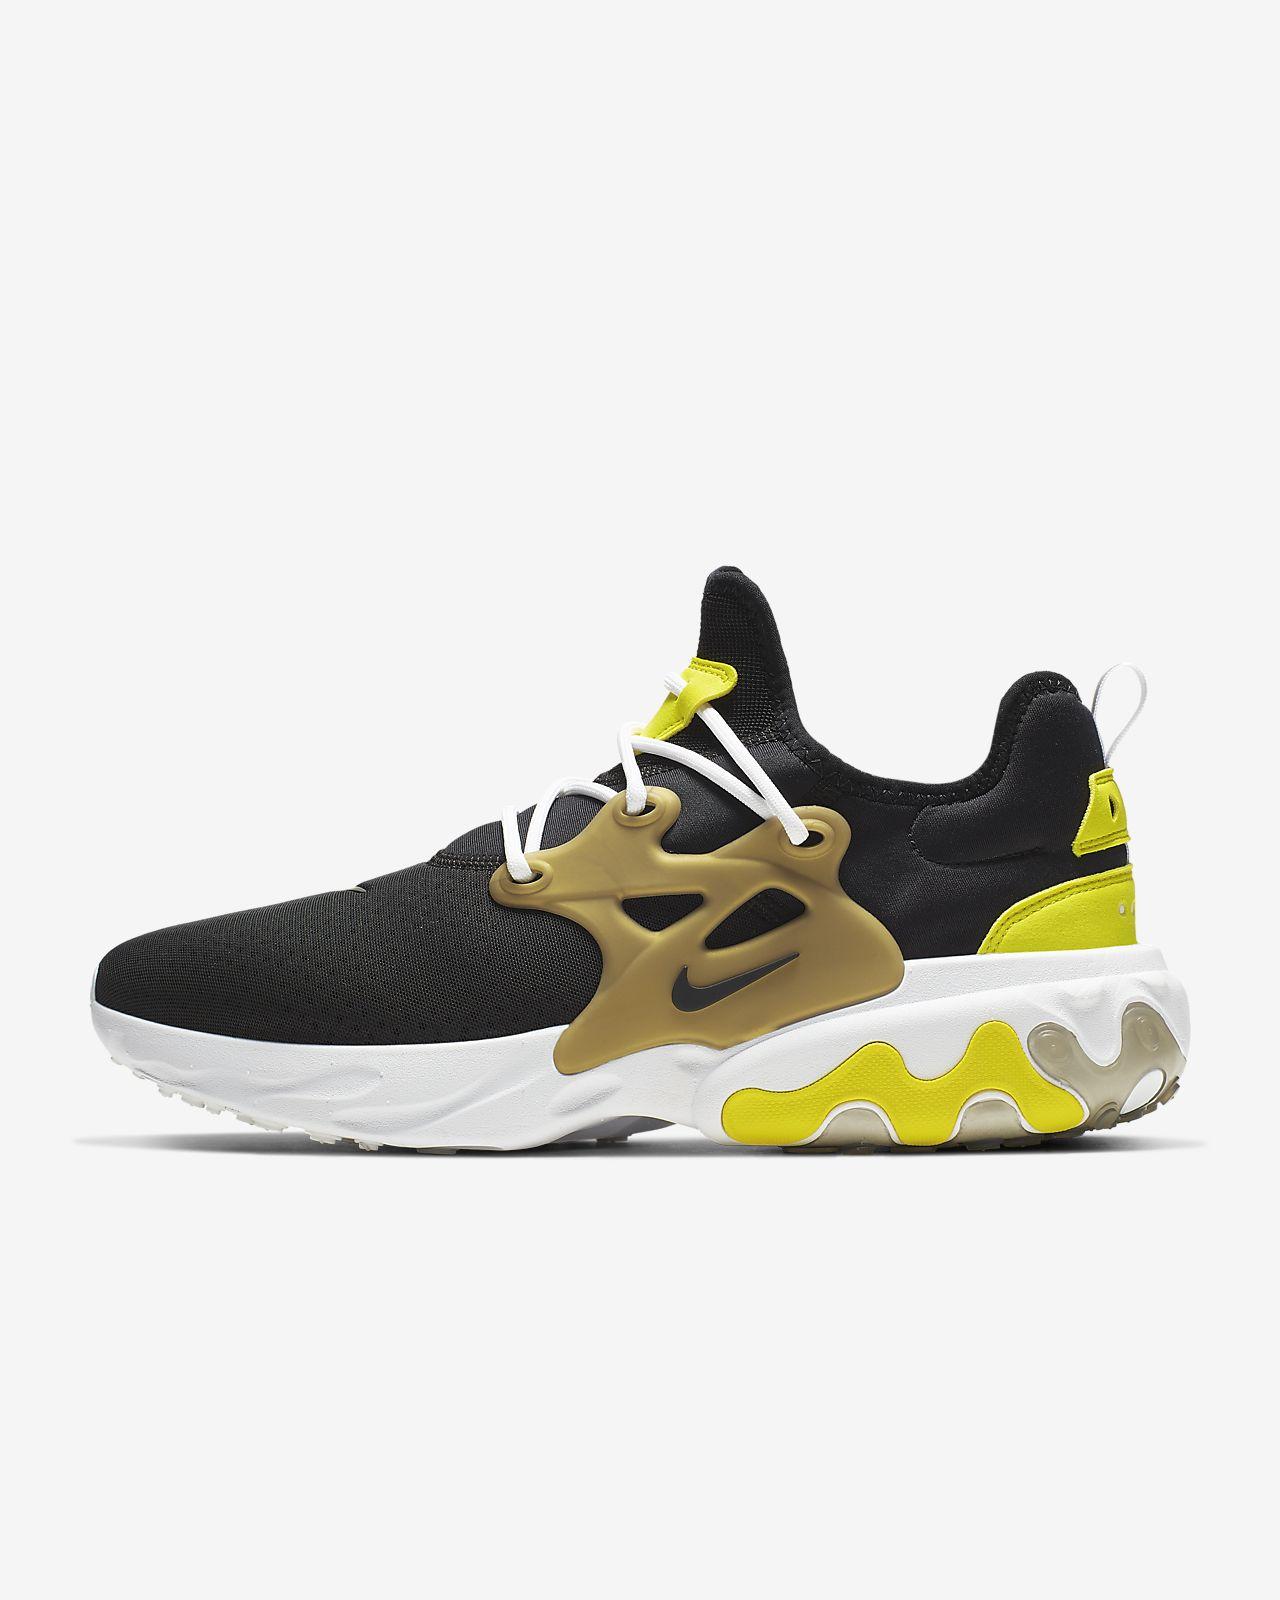 Nike React Presto Brutal Honey Men's Shoe